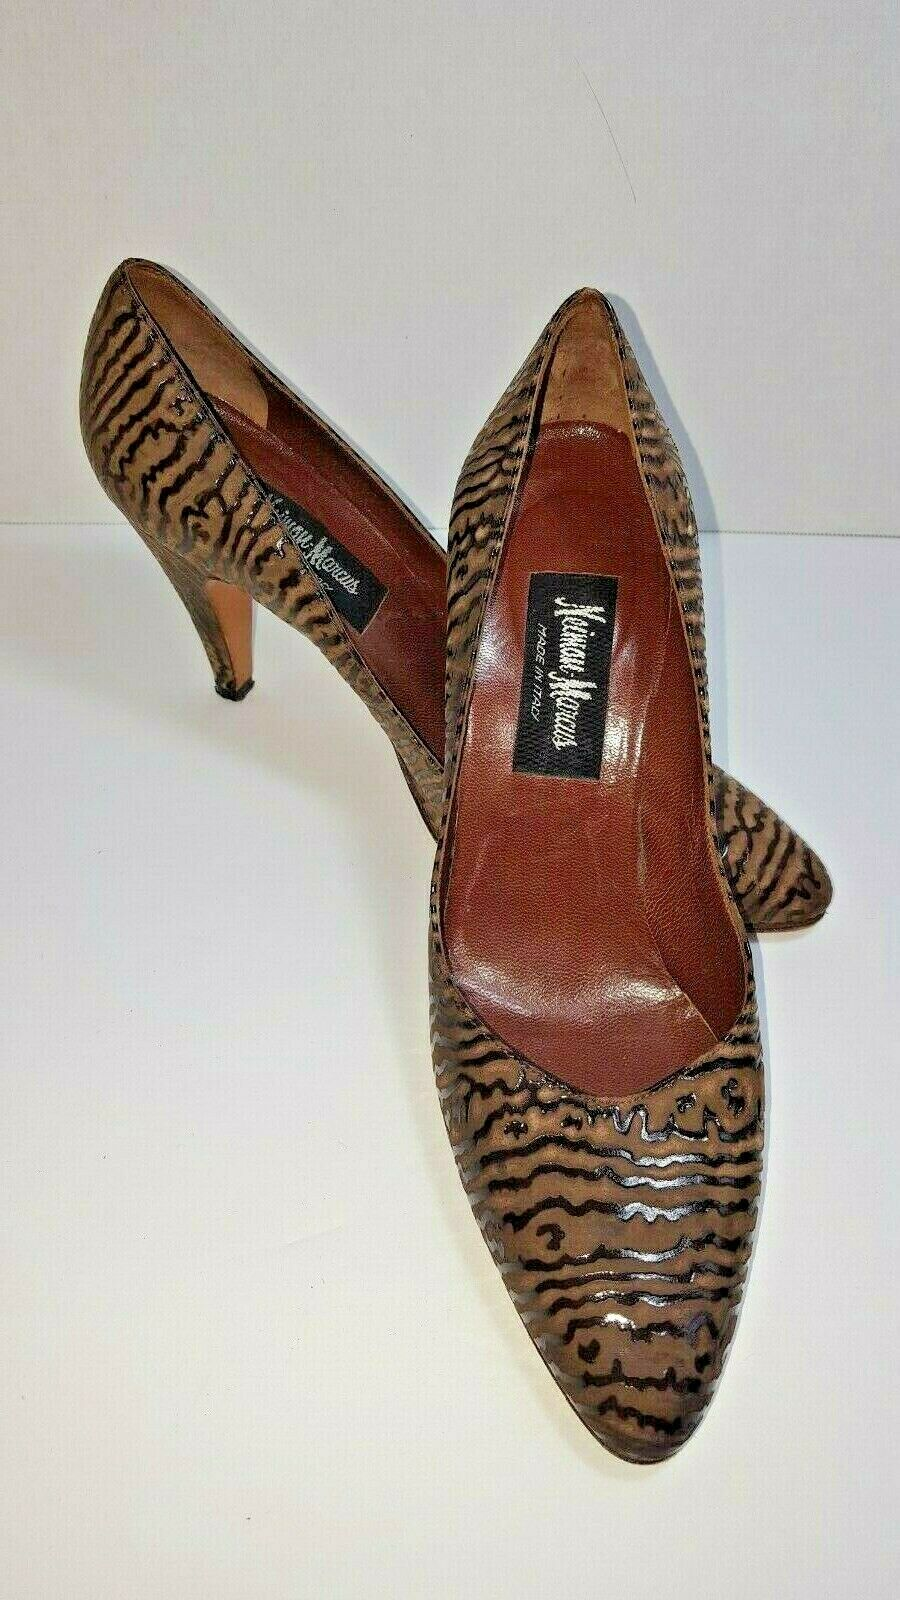 negozio outlet Neiman Marcus nero Marrone Suede Pumps Dimensione 6 N Dress Dress Dress scarpe Heel  Stripped  esclusivo